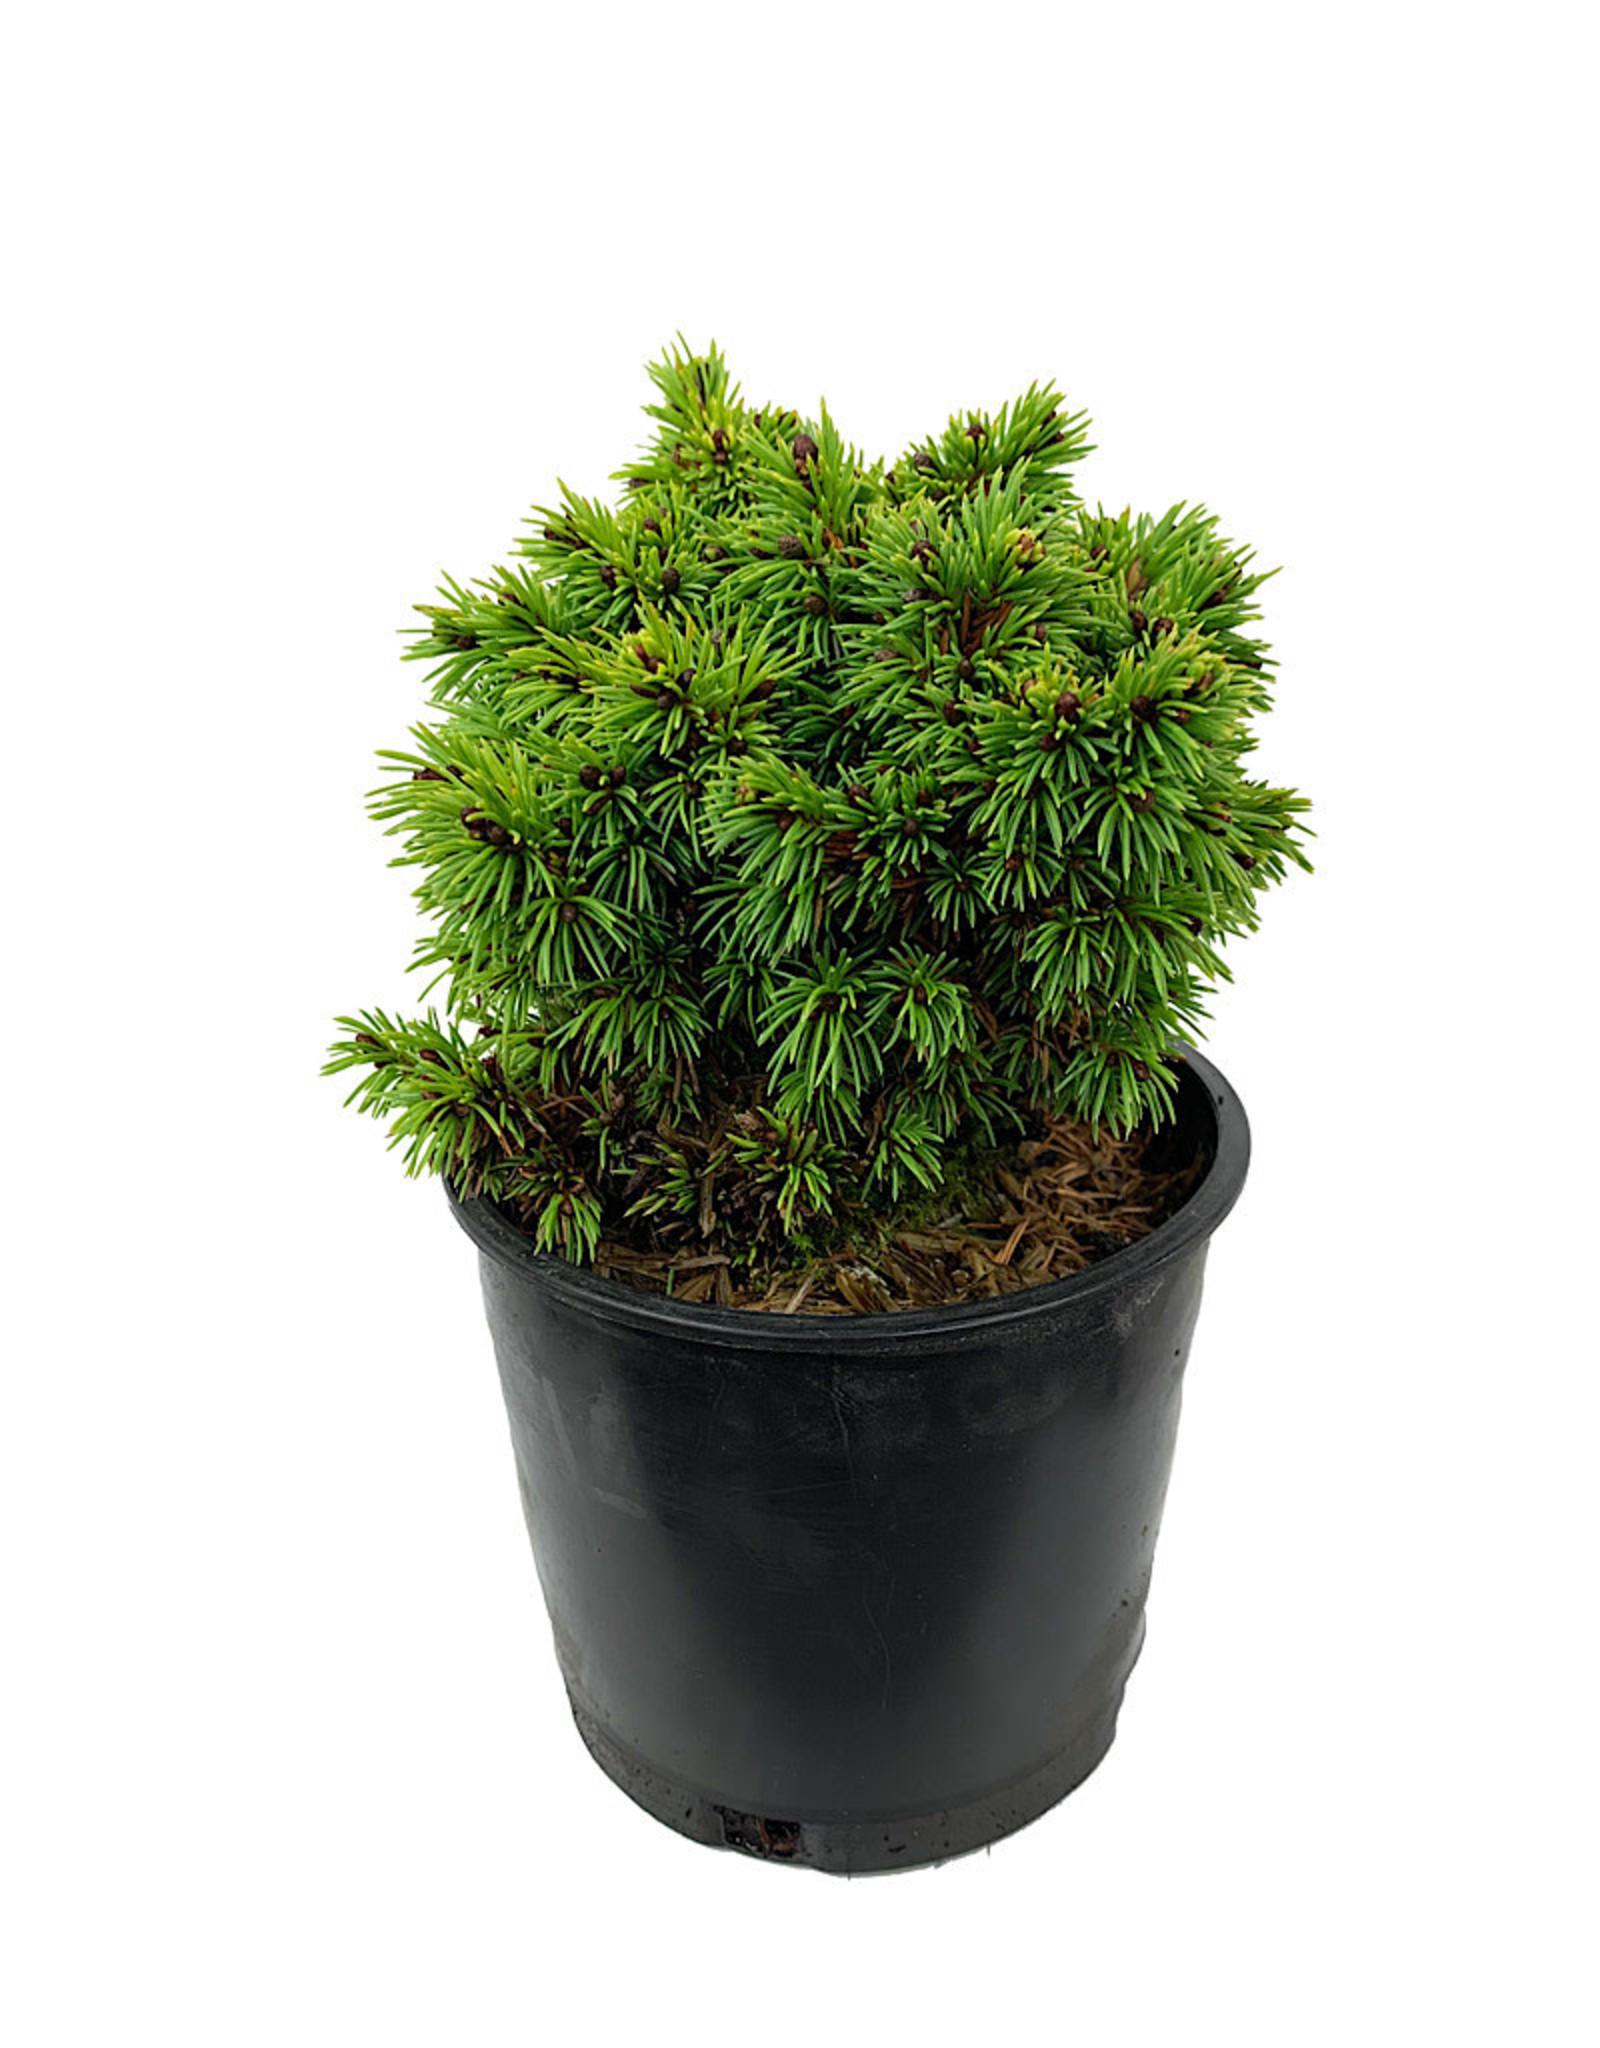 Picea glauca 'Elf' 4 Inch